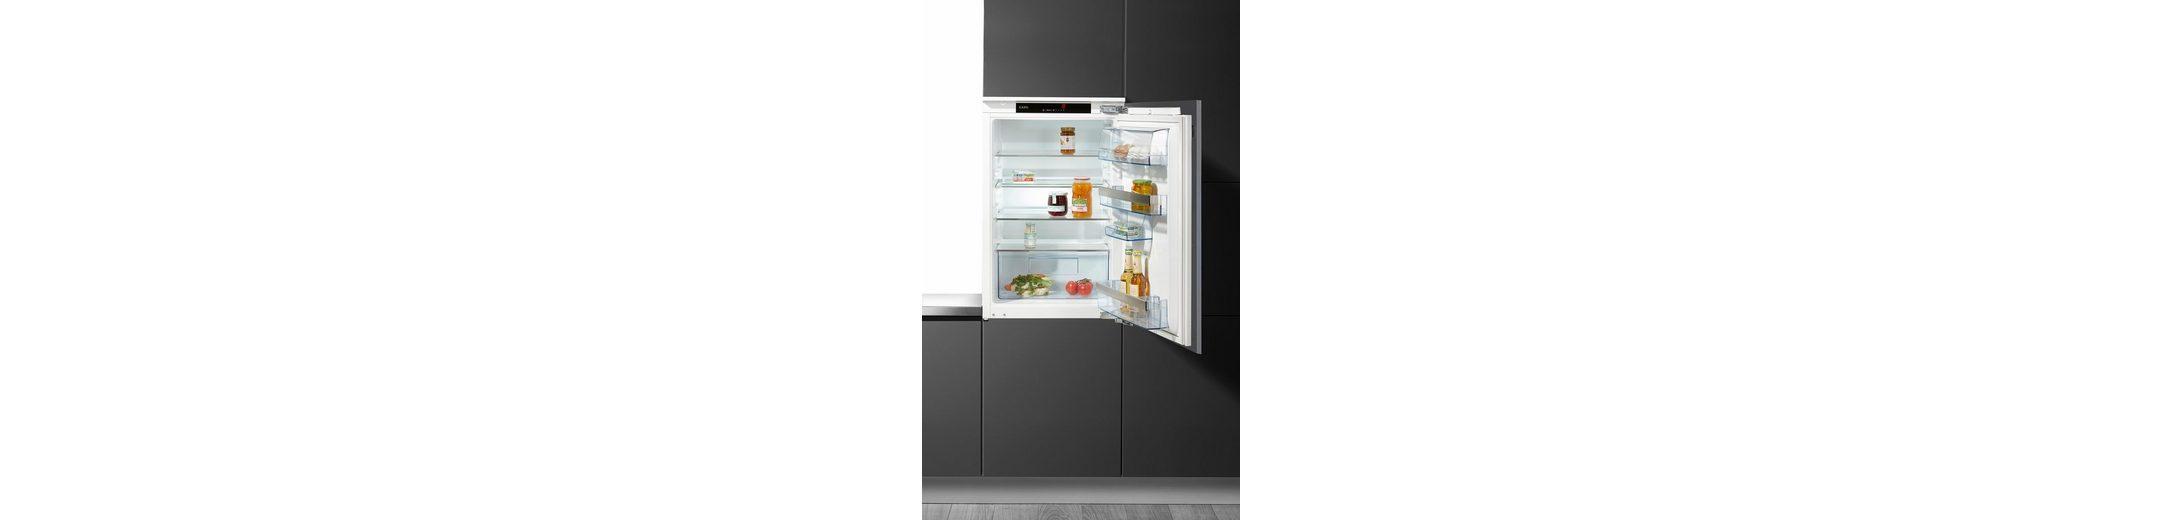 AEG integrierbarer Einbaukühlschrank SANTO SKS98800C5, A+++, 87,3 cm